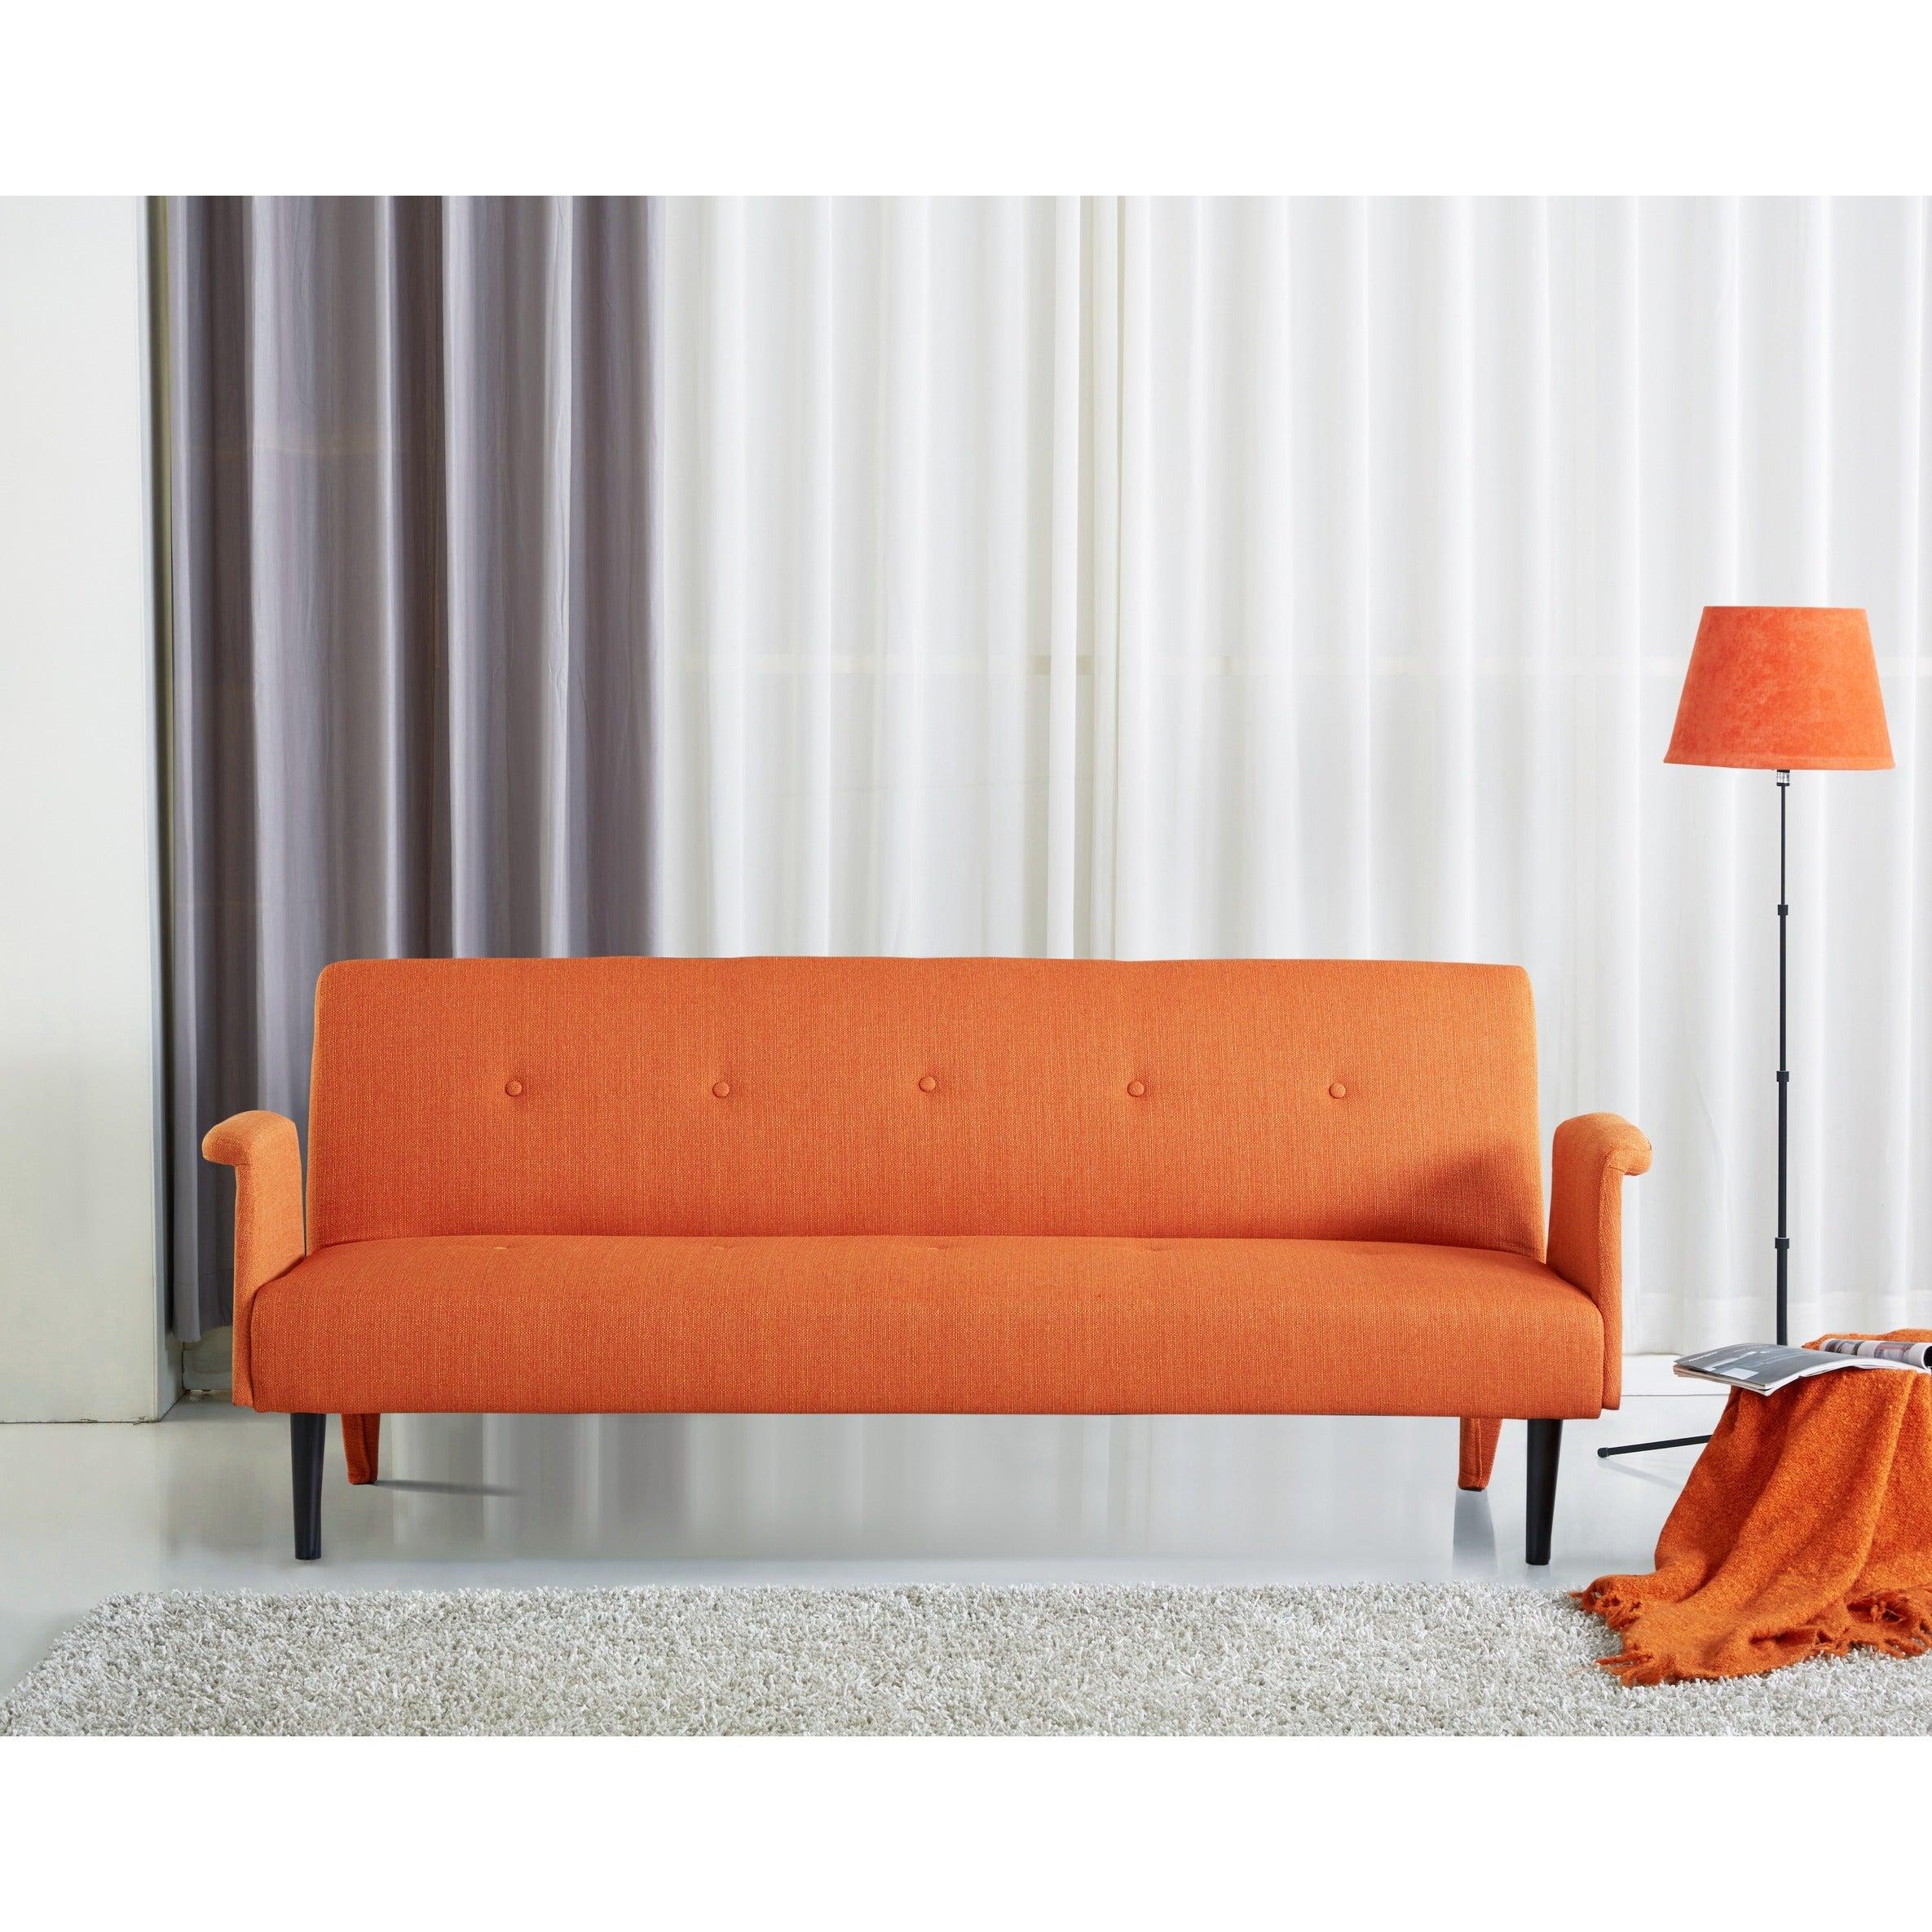 Sitswell Naomi Orange Futon Sofa Sleeper Bed On Free Shipping Today 10455769